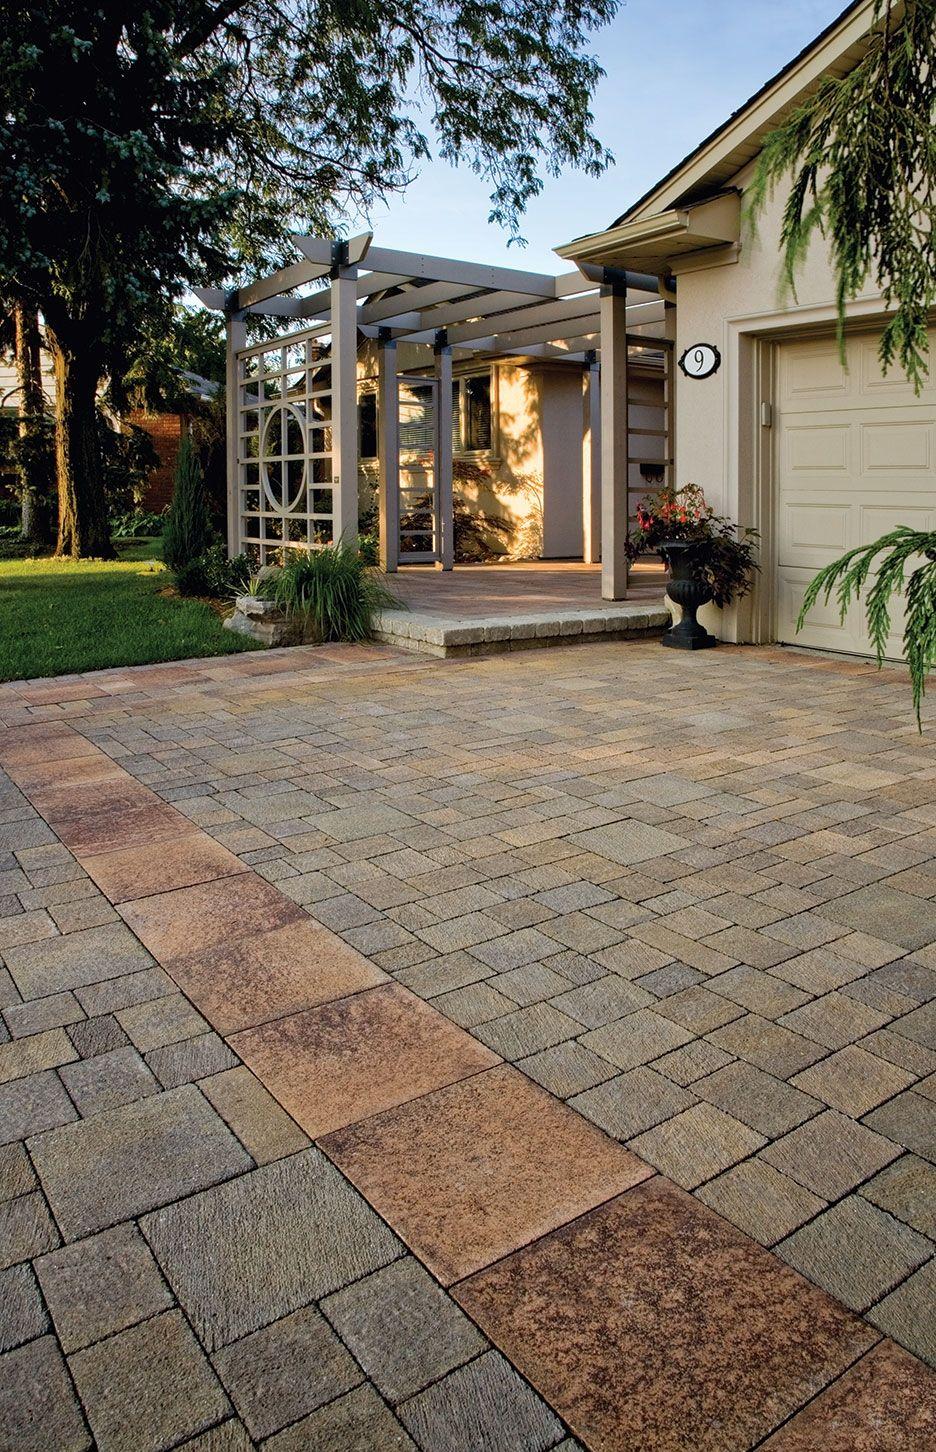 interlocking pavers for home driveways amp walkways - HD936×1452